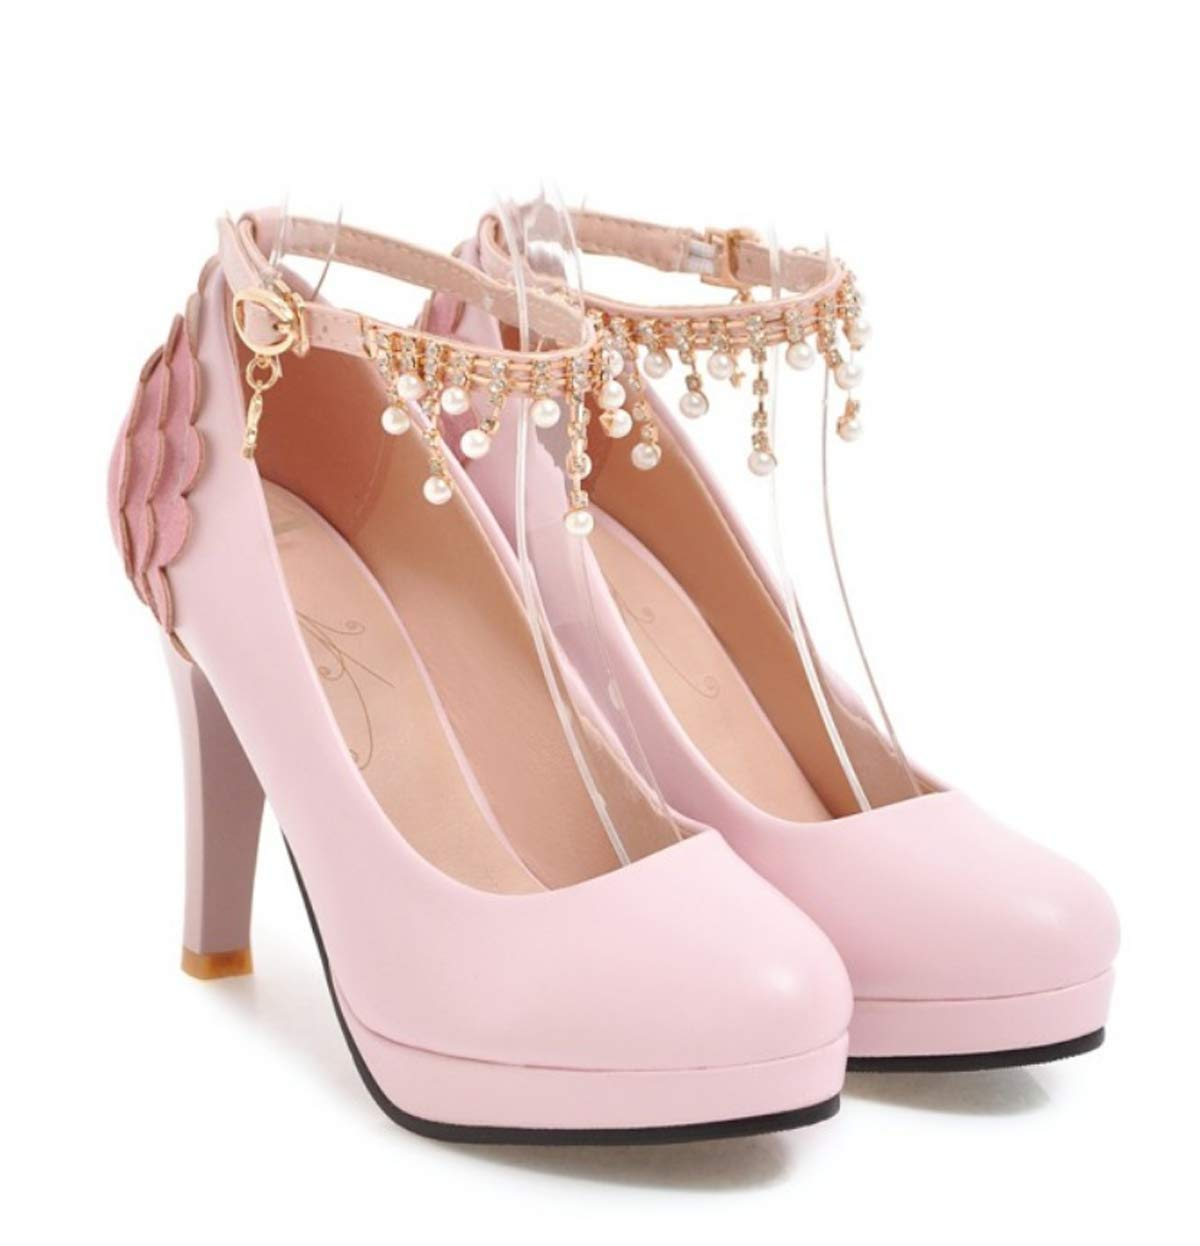 HBDLH Damenschuhe/Frühjahr Damen 11Cm High Heels Damenschuhe Hundert Stiche Wasserdicht Flachen Einzelne Schuhe Mode-Wasser-Diamanten Prinzessin Schuhe